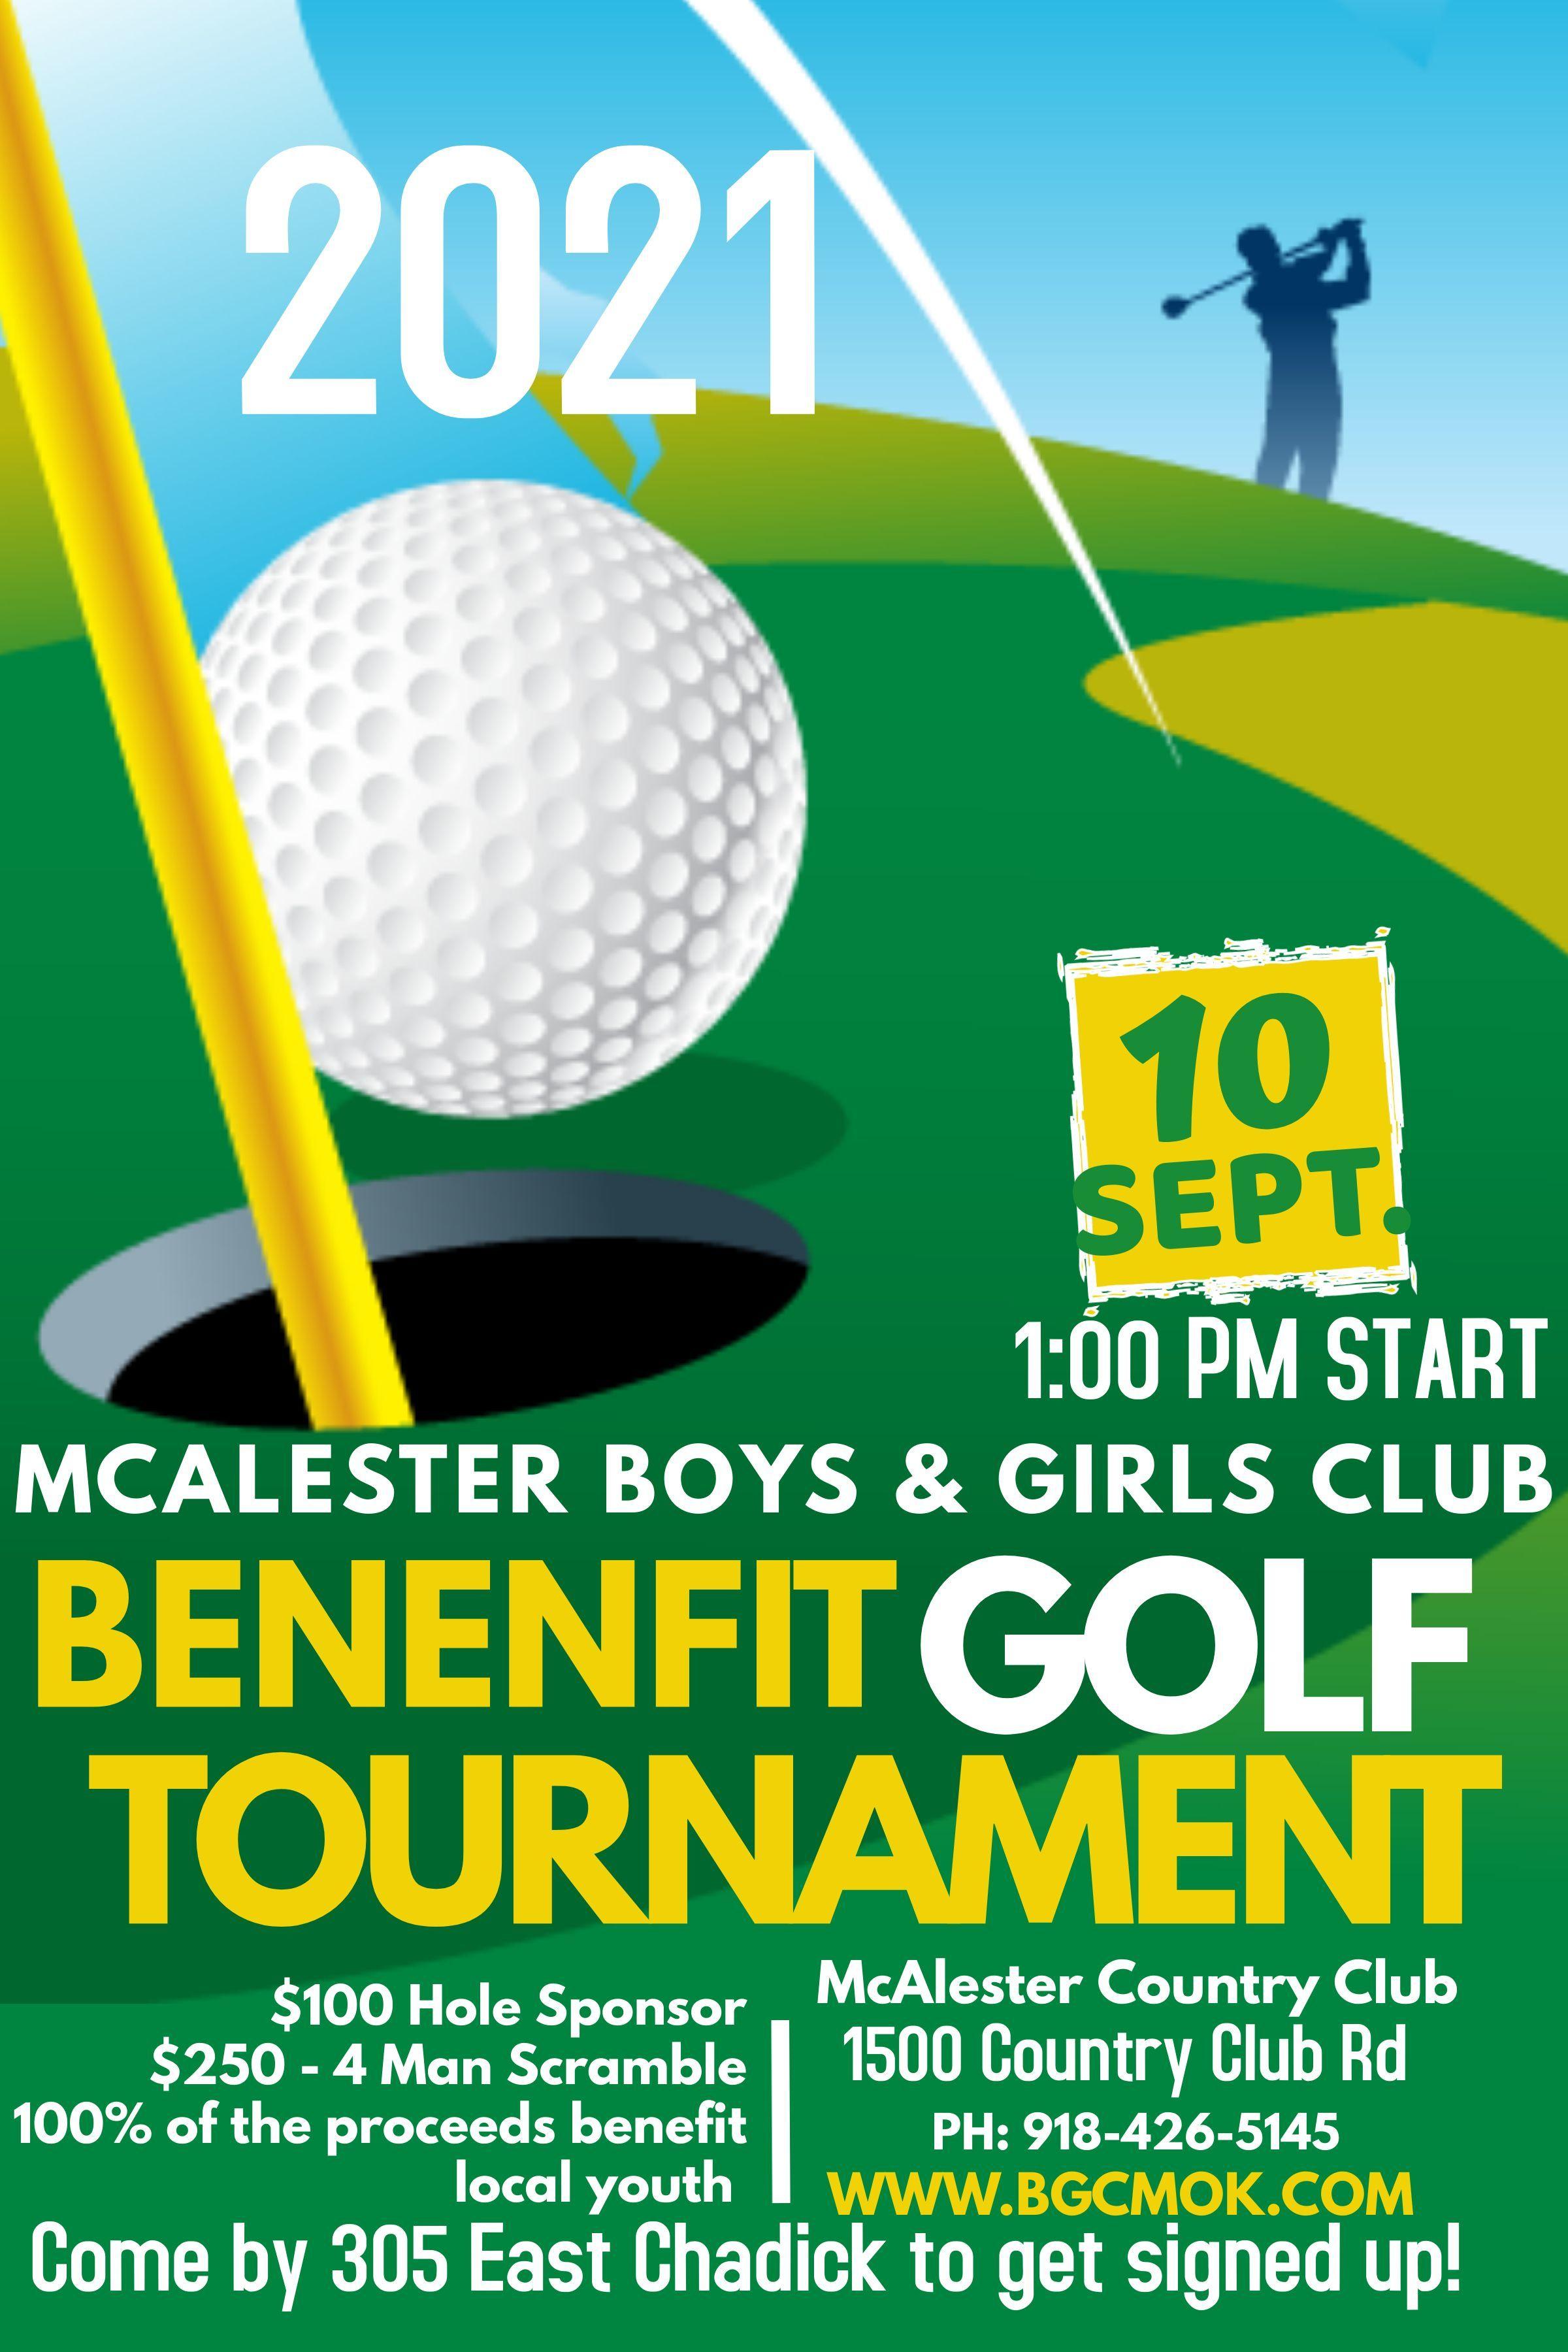 2021 Benefit Tournament